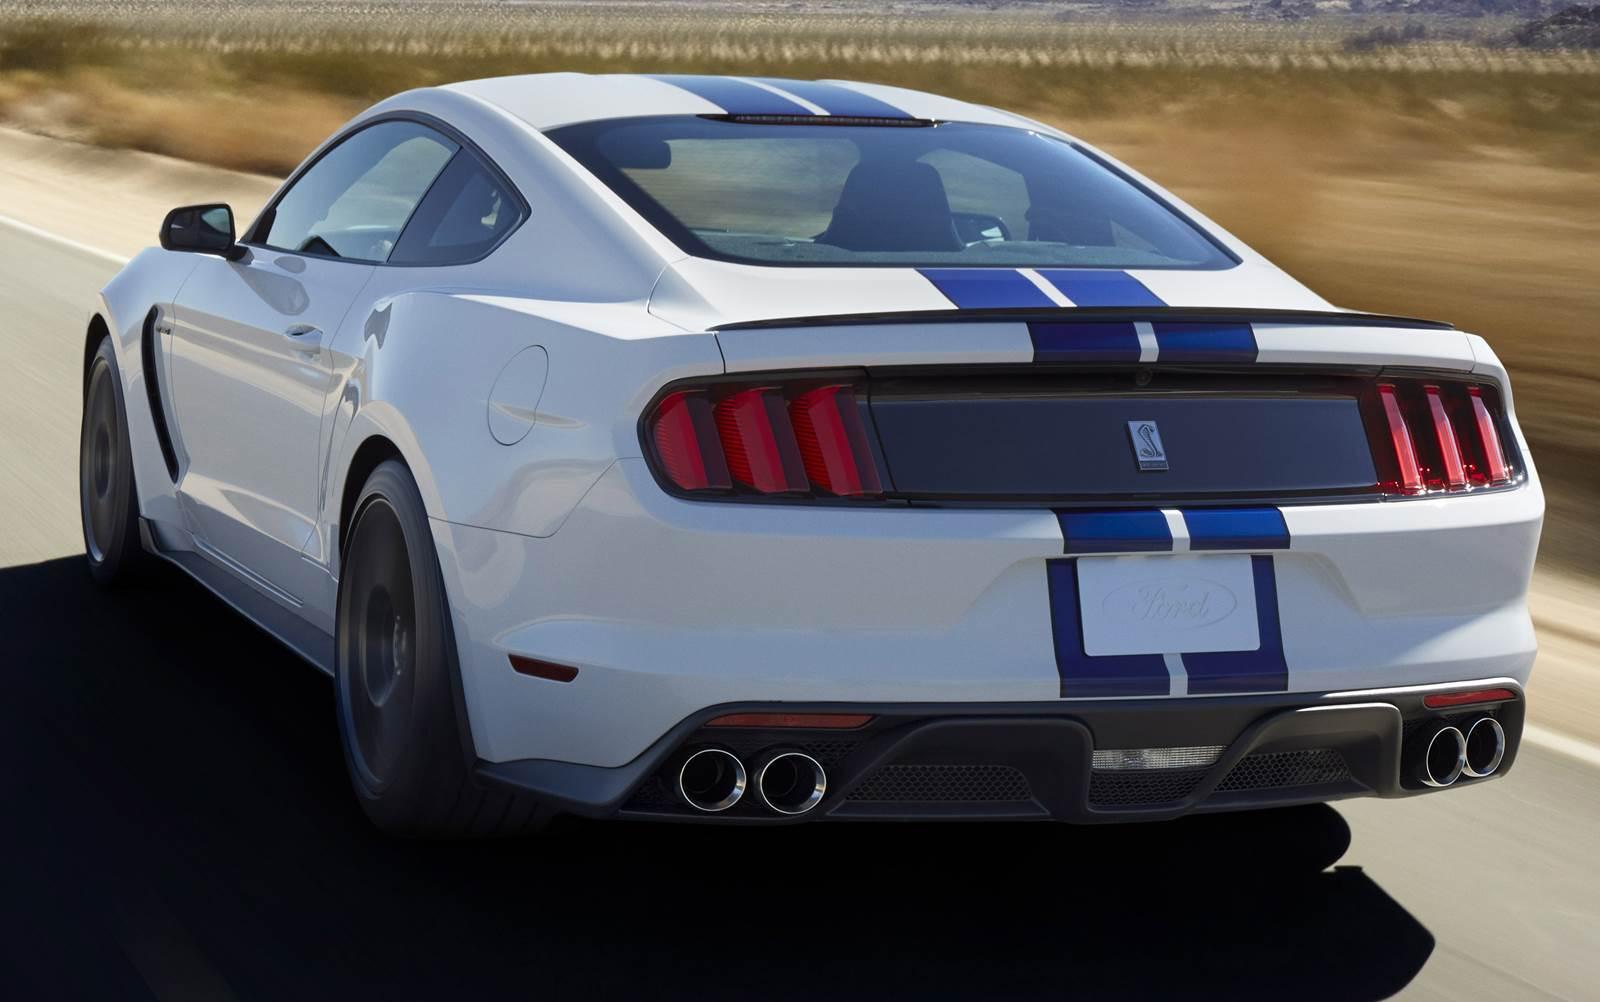 Novo Mustang Shelby Gt350 2015 Fotos E Especifica 231 245 Es